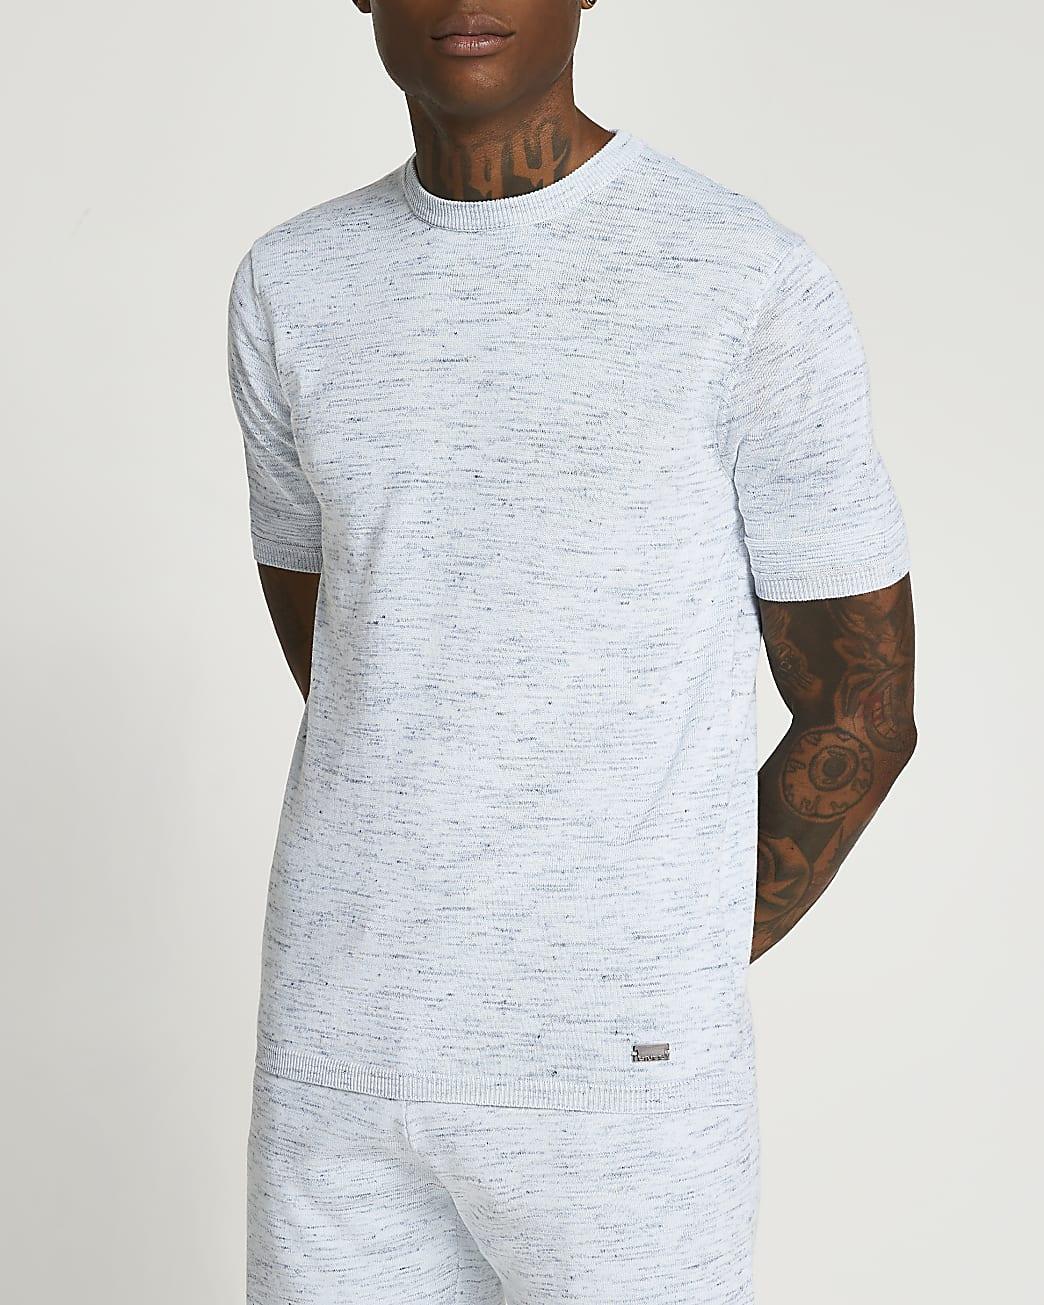 Blue slim fit t-shirt